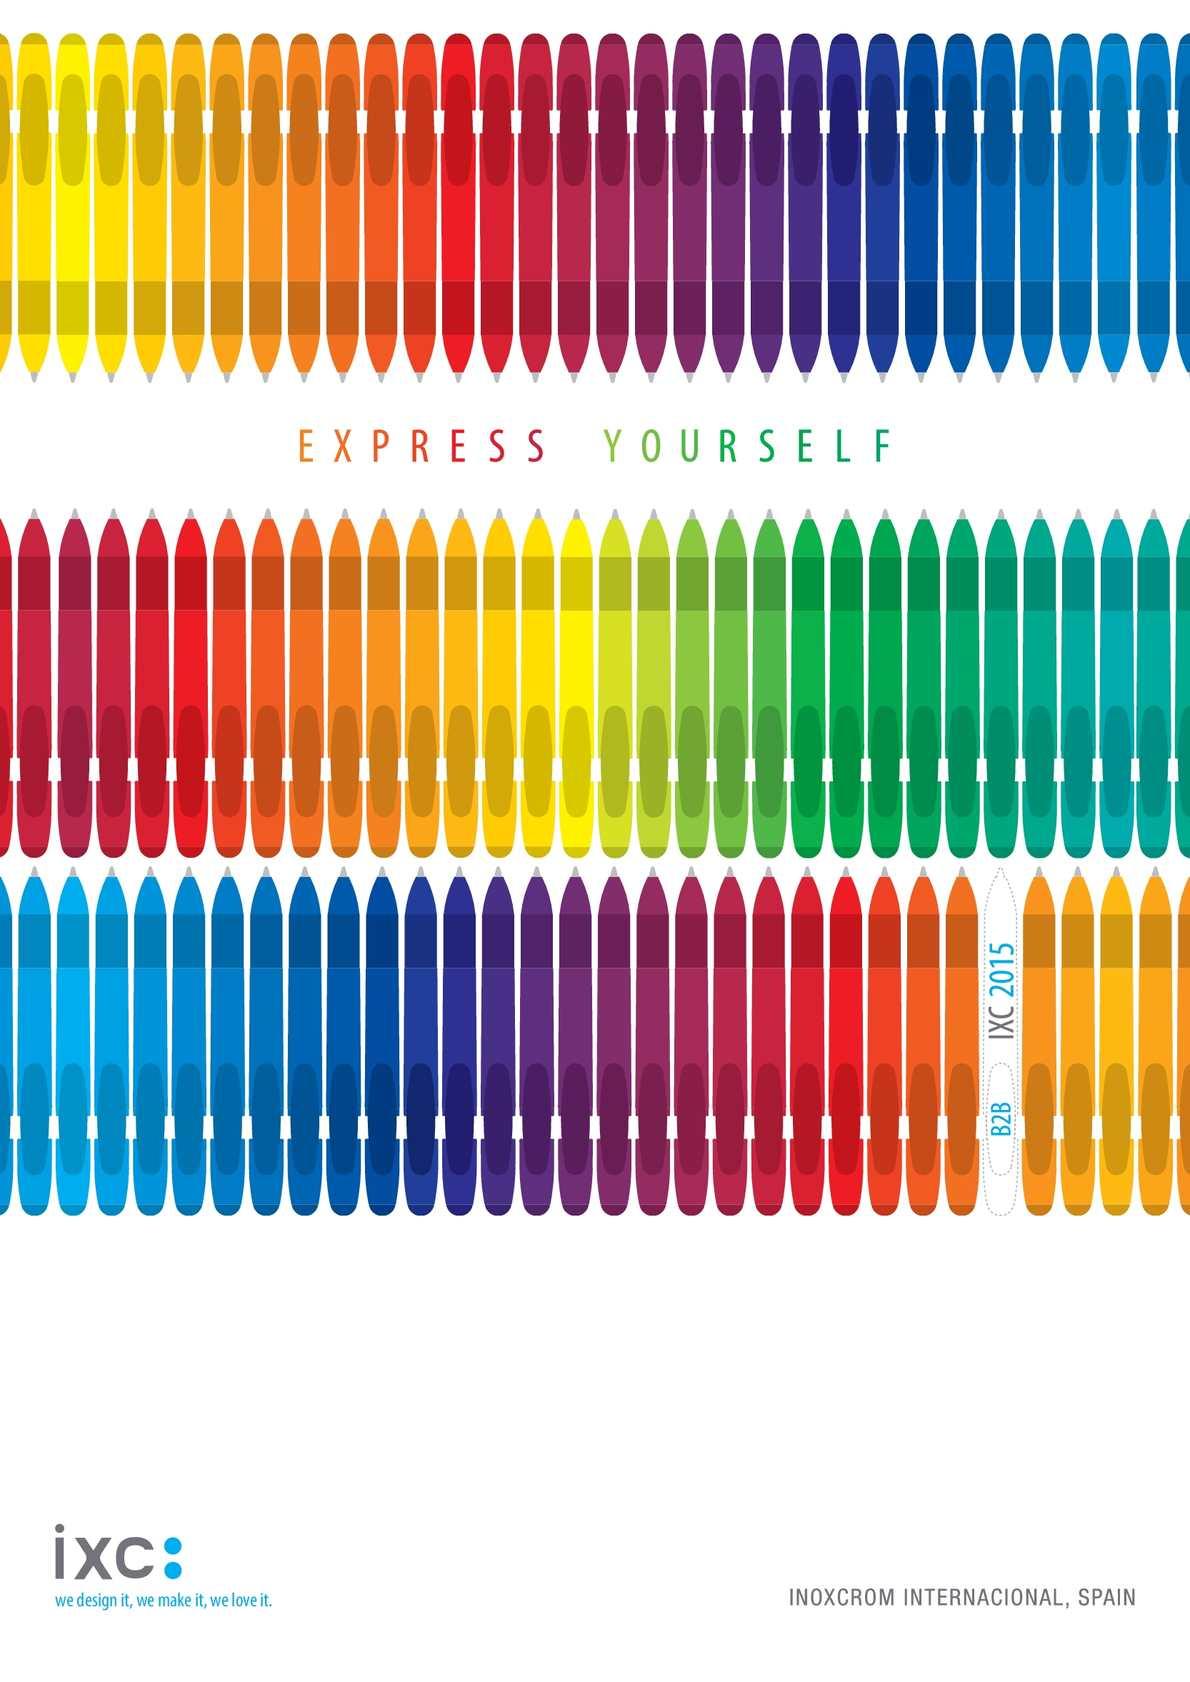 Bolígrafo ingravid color gris Inoxcrom